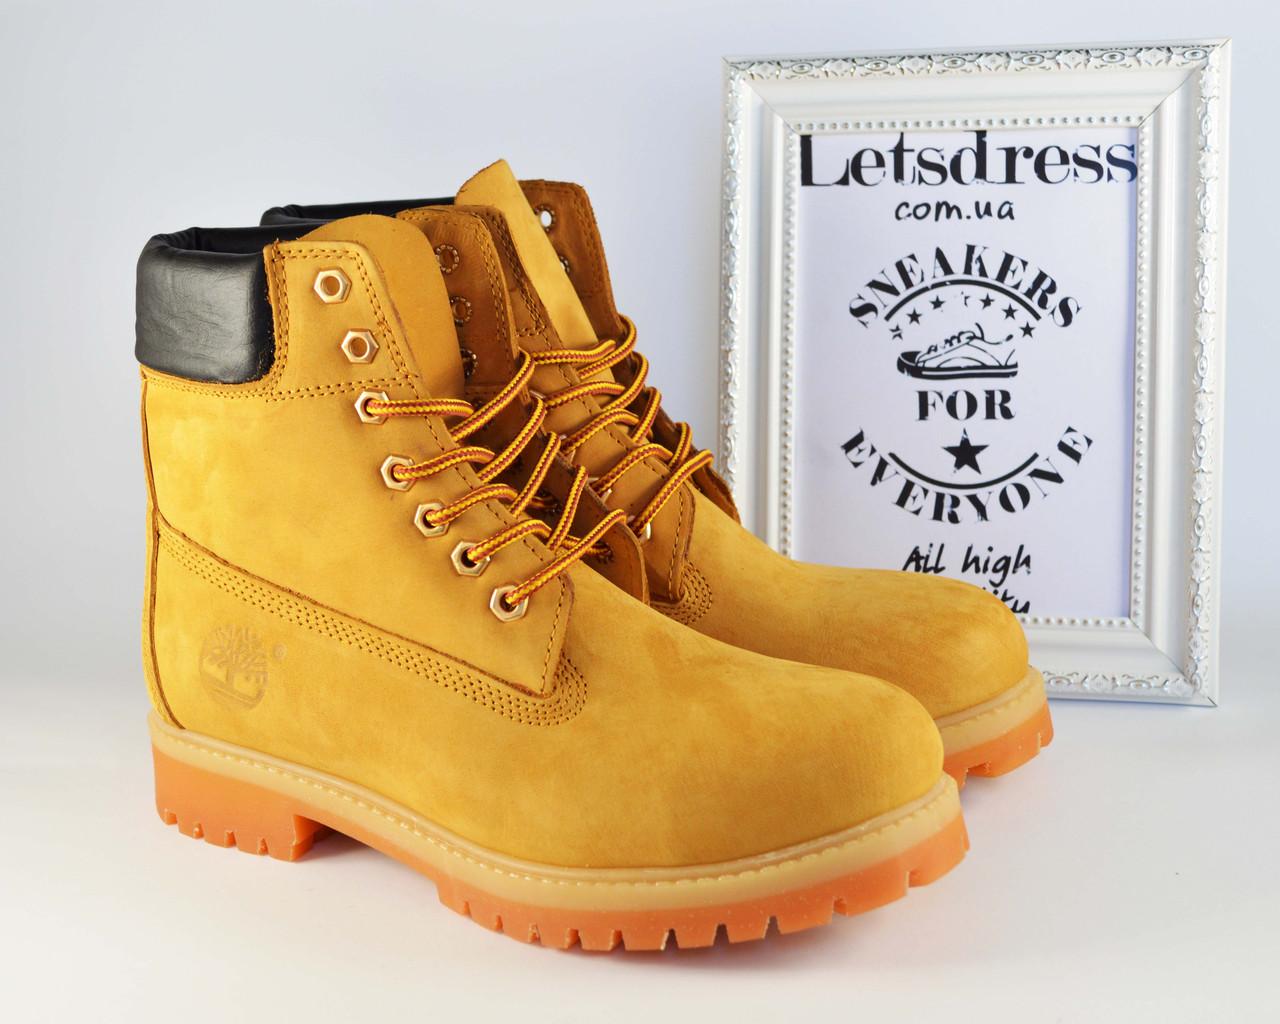 d7b4de39 Мужские кожаные ботинки Timberland Classic 6 inch Yellow Тимберленд желтые  бежевые